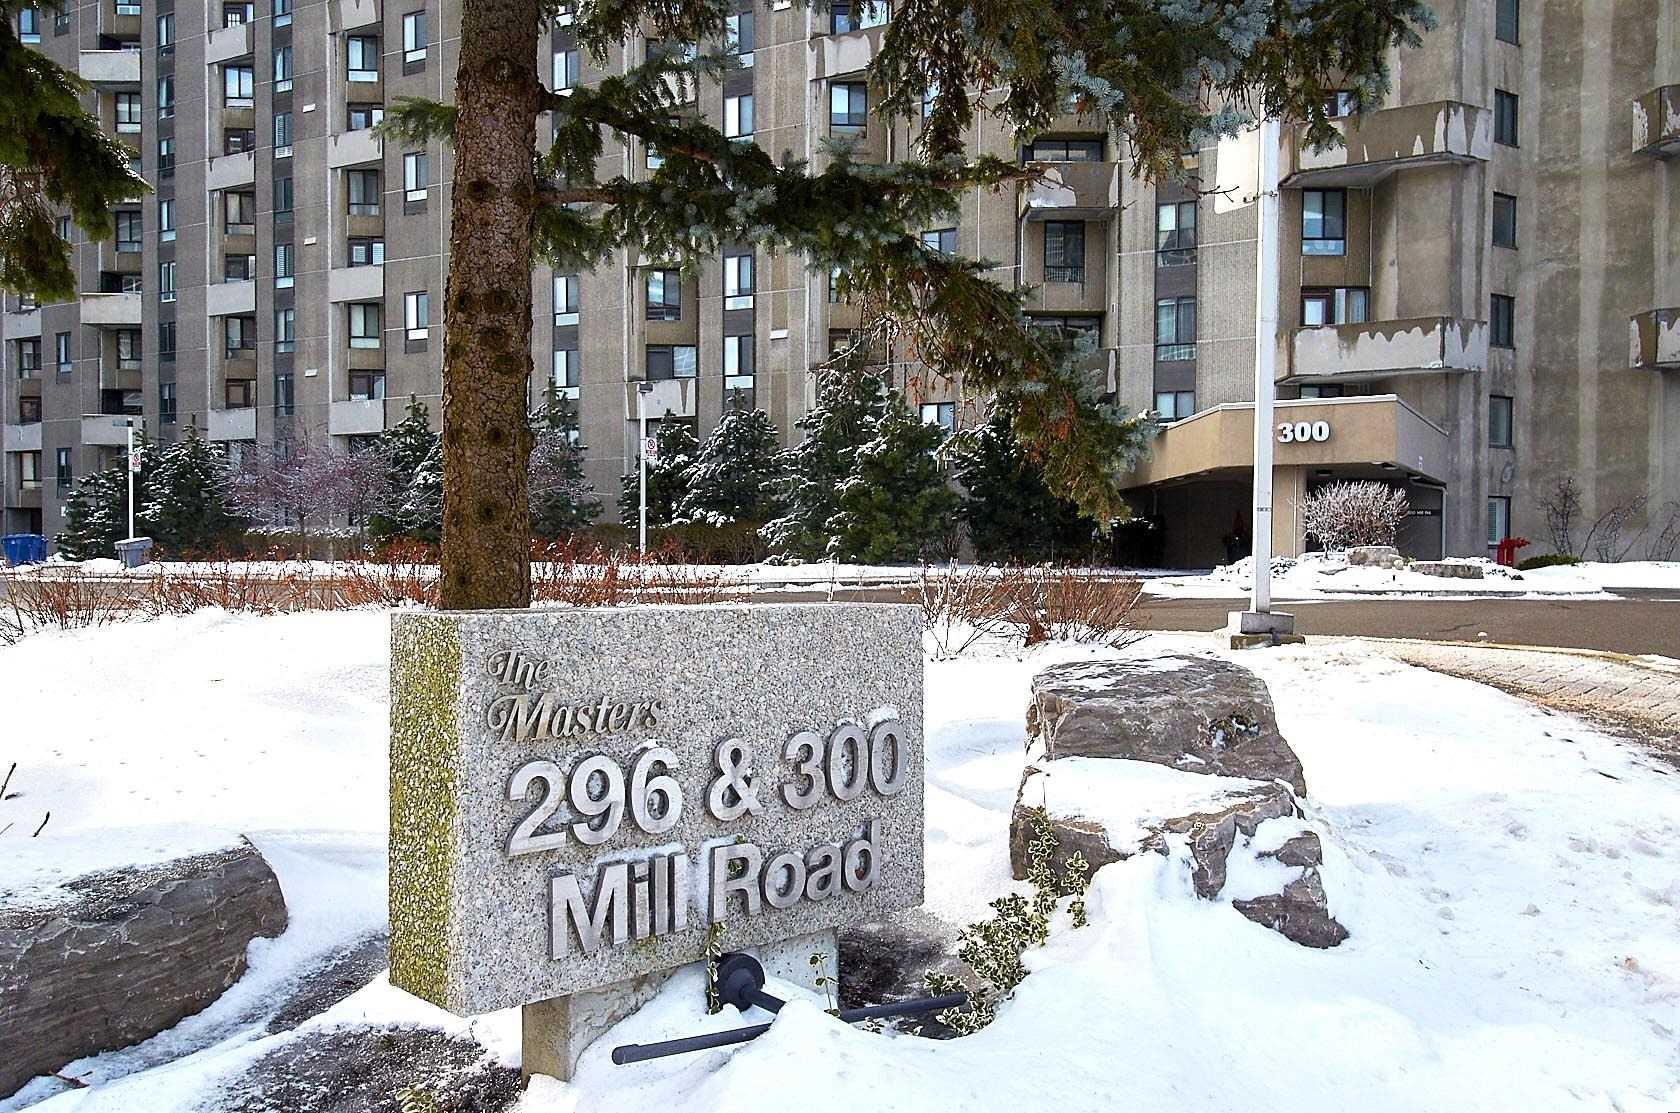 Buliding: 300 Mill Road, Toronto, ON